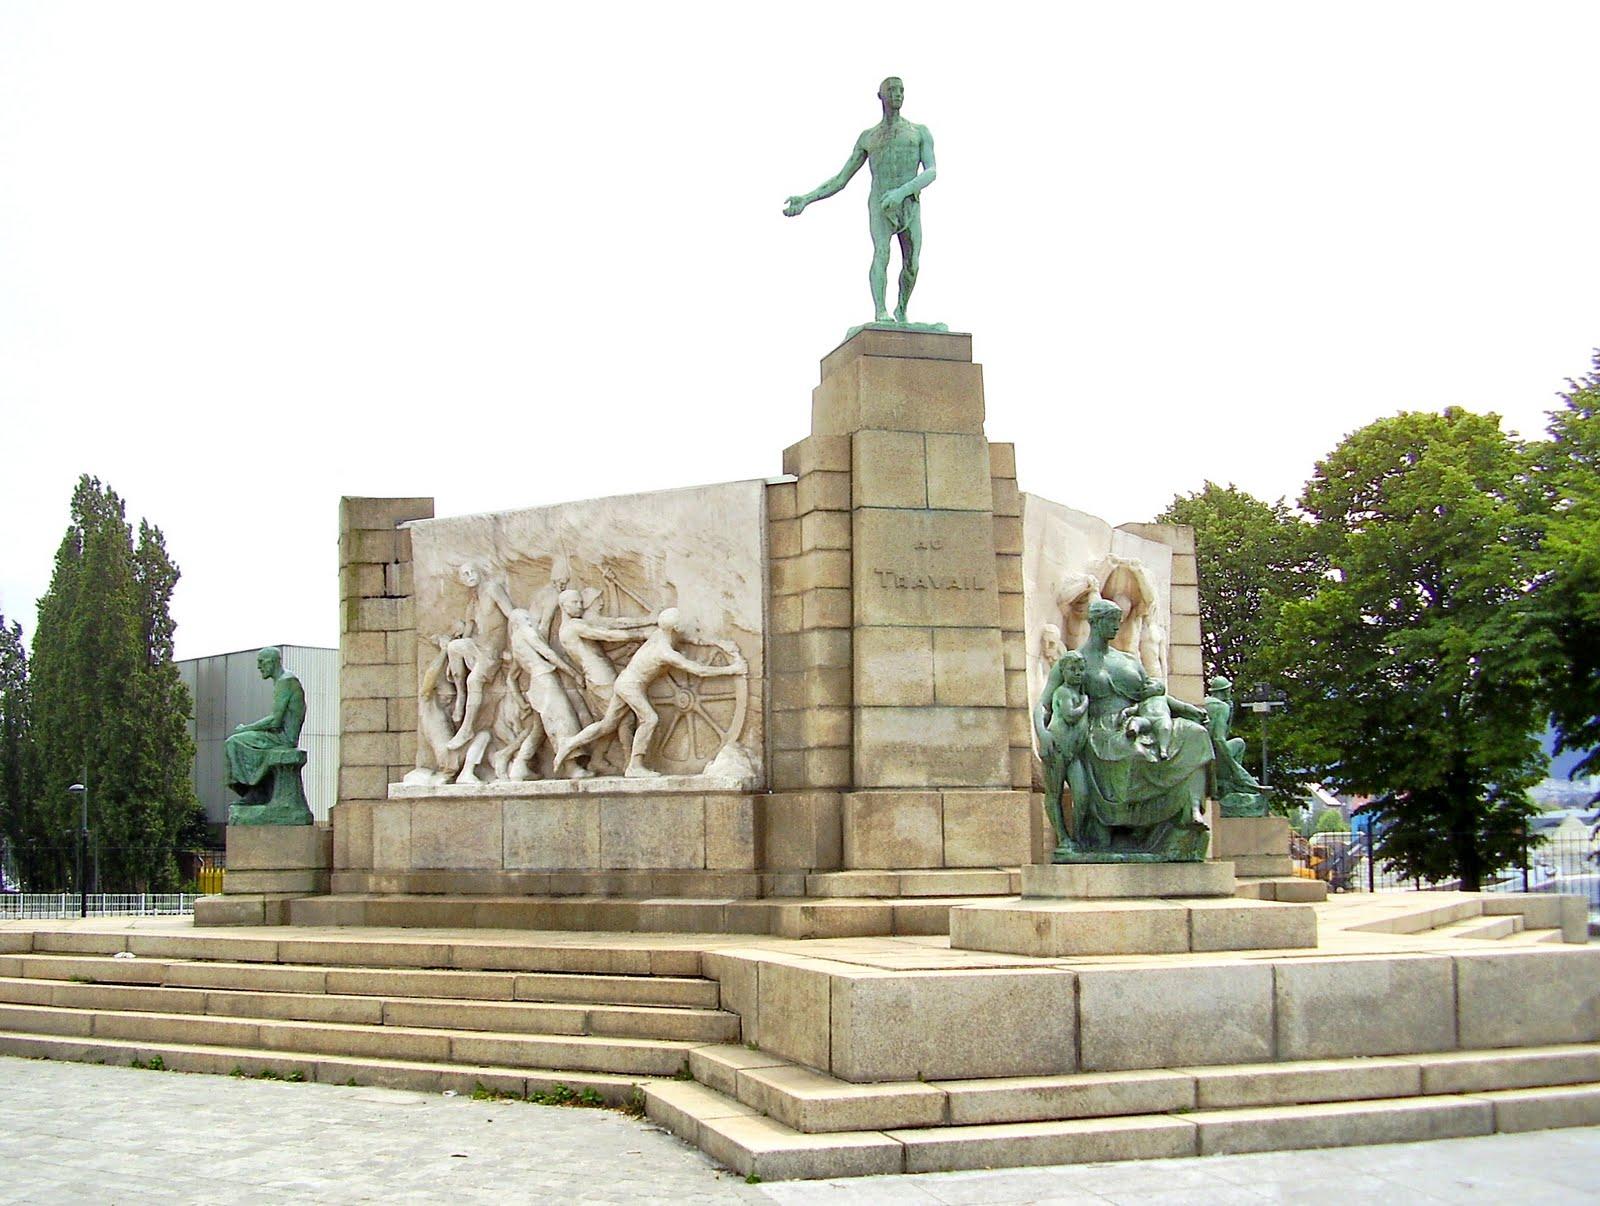 Objetivo Bruselas: TRABAJAR EN BRUSELAS: ¿Te interesa un empleo en ...